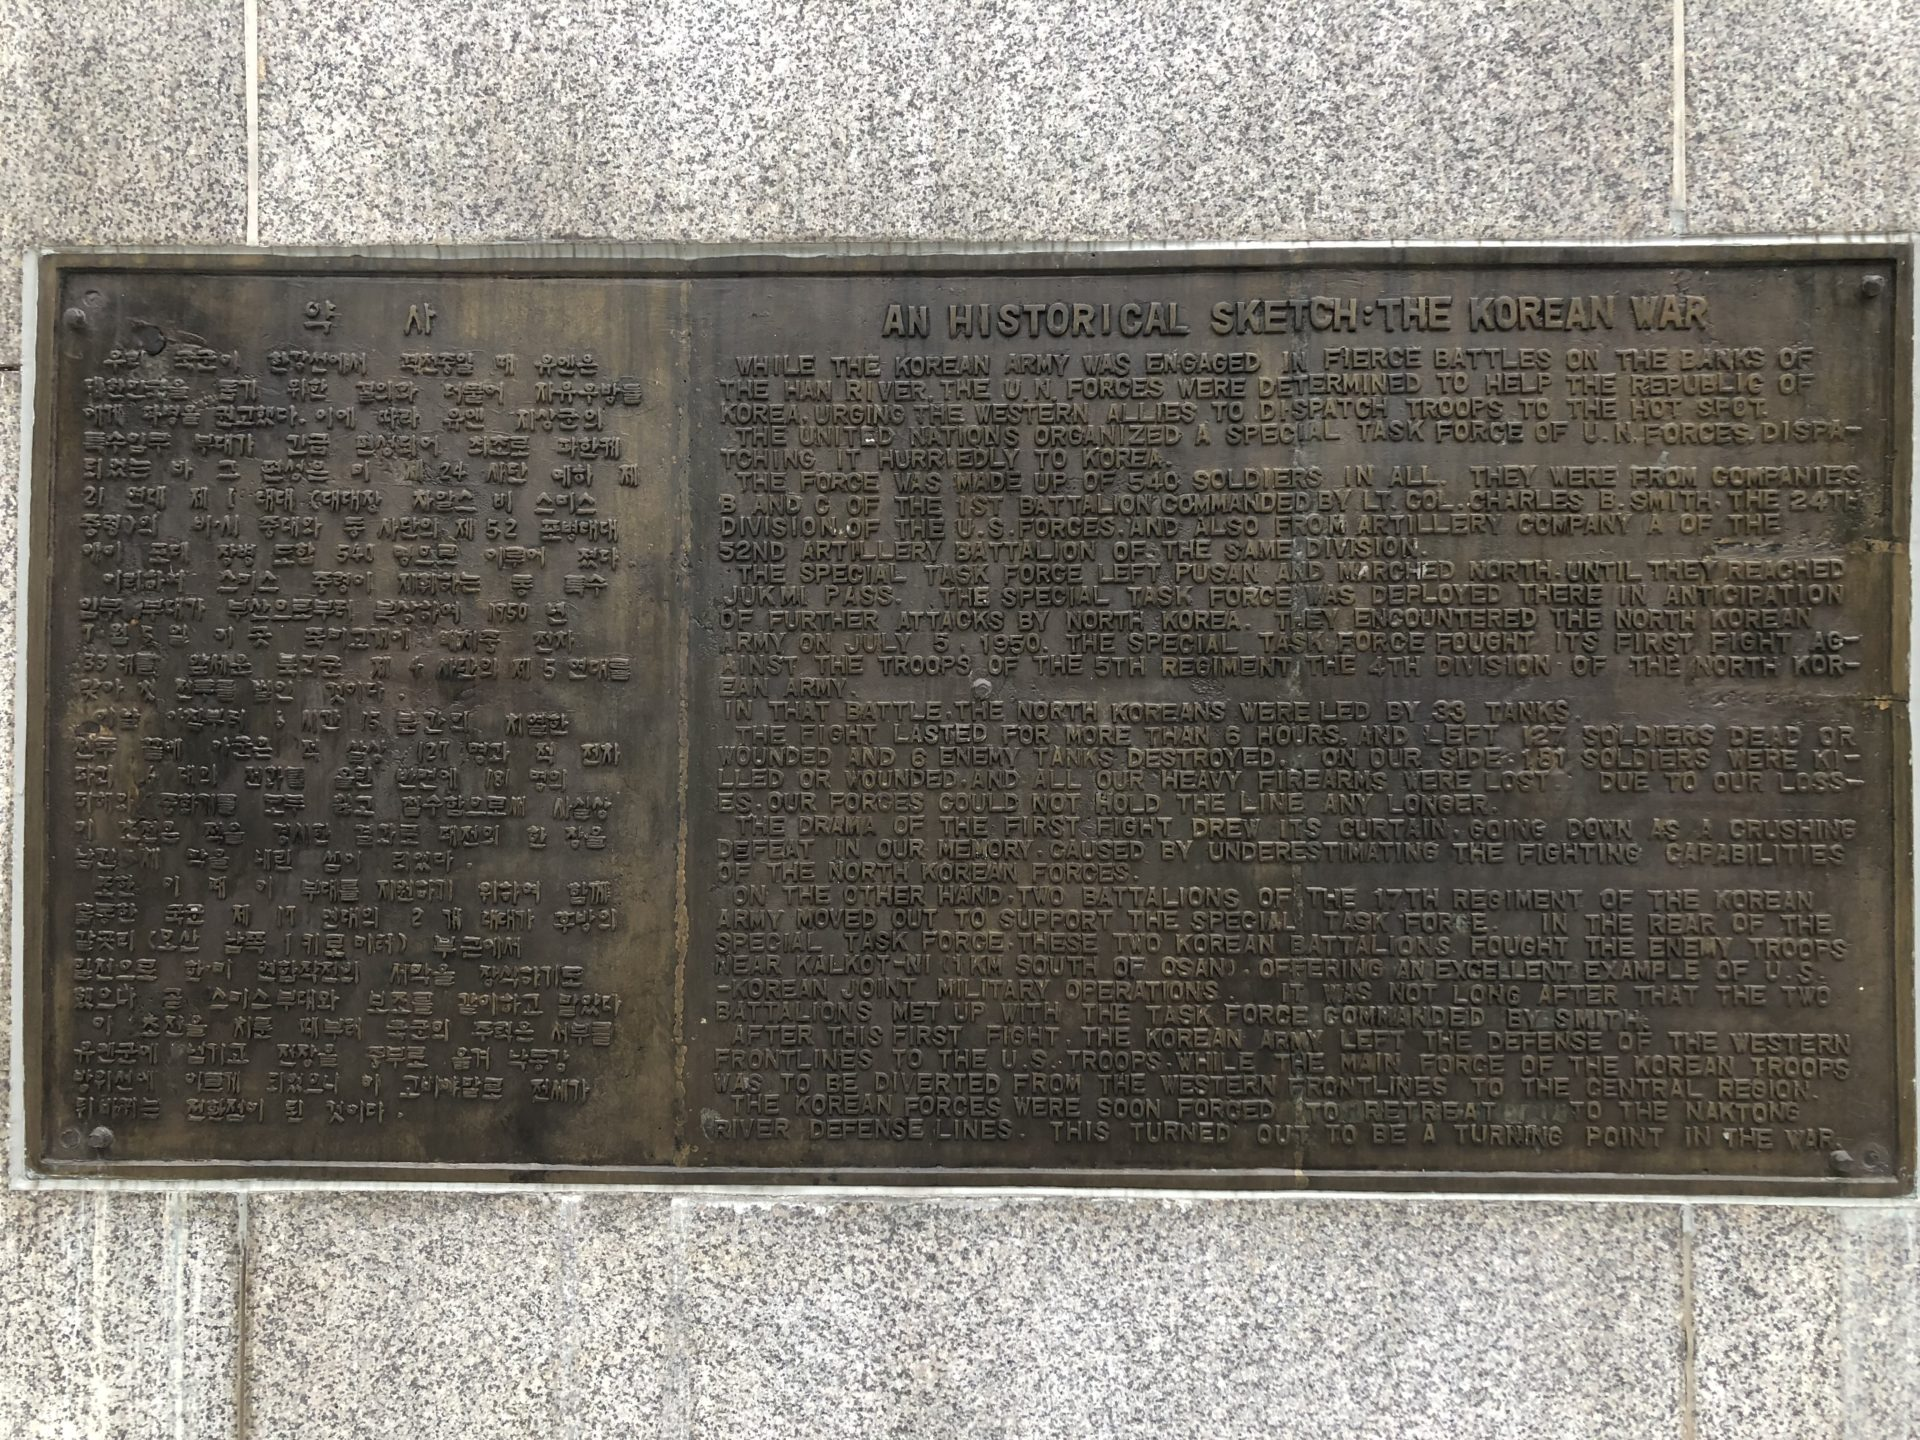 Korean War Memorials - 742 Gyeonggi-daero